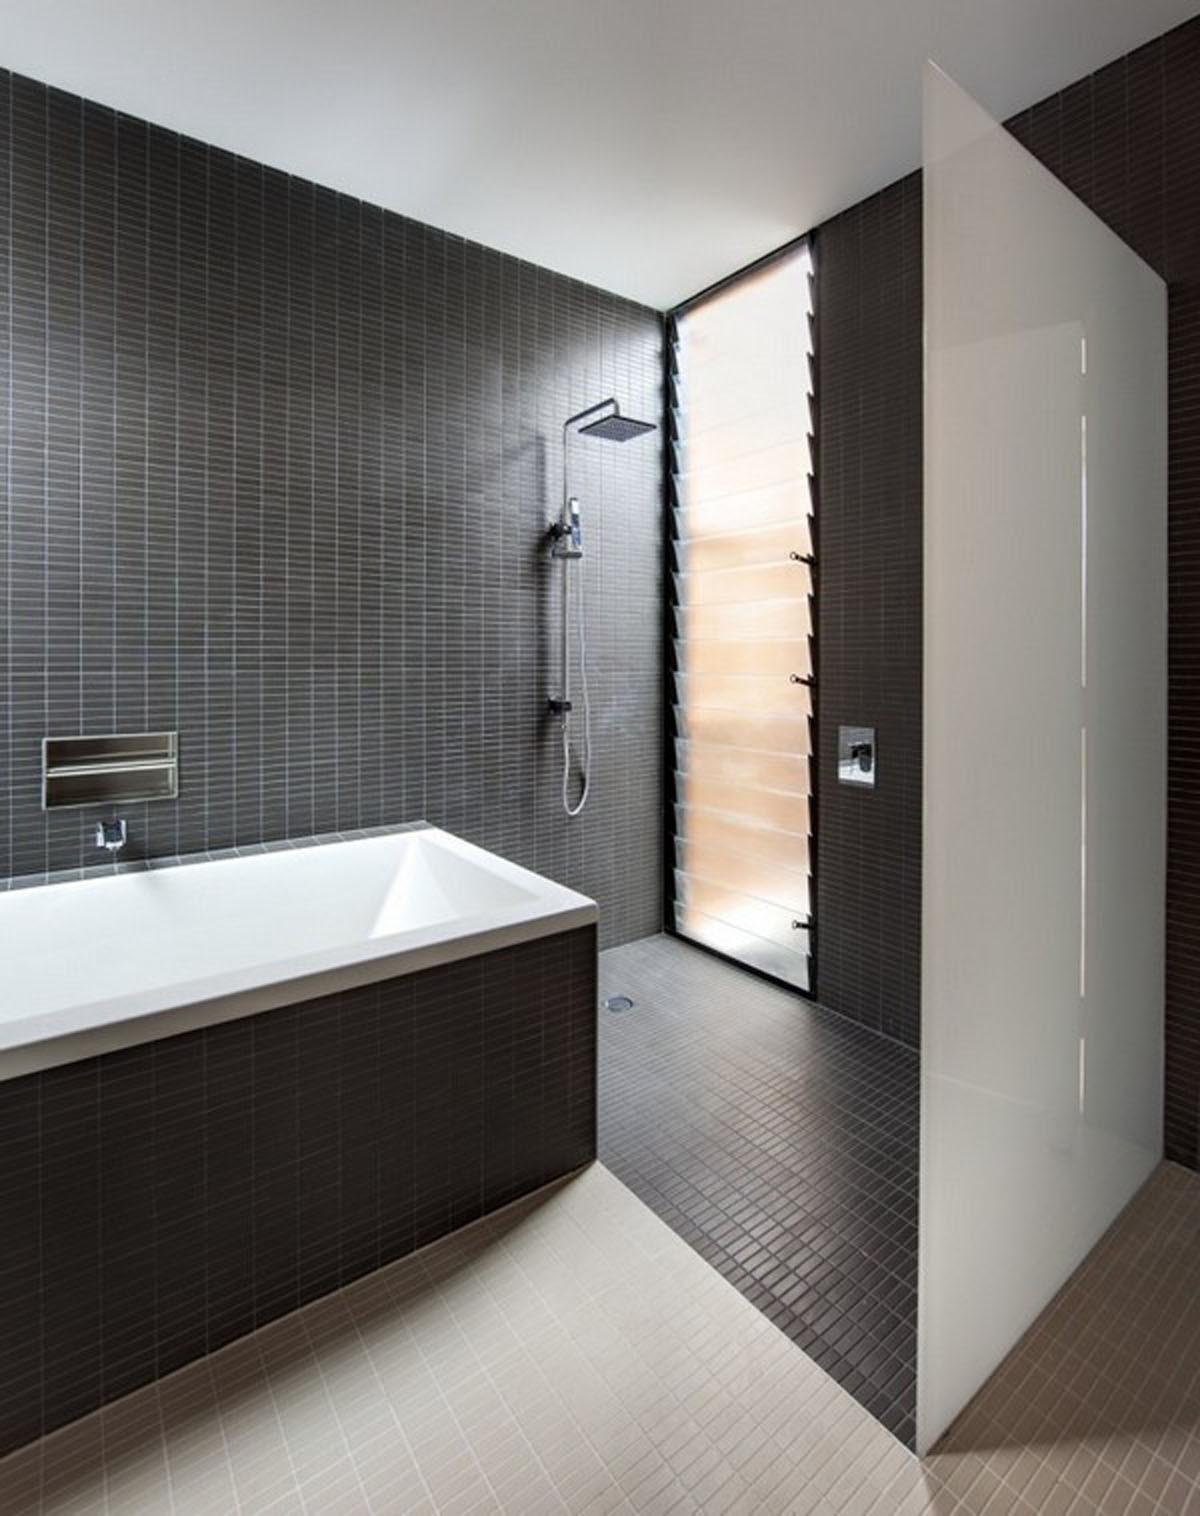 Black and White Theme for Minimalist Bathroom Ideas ...